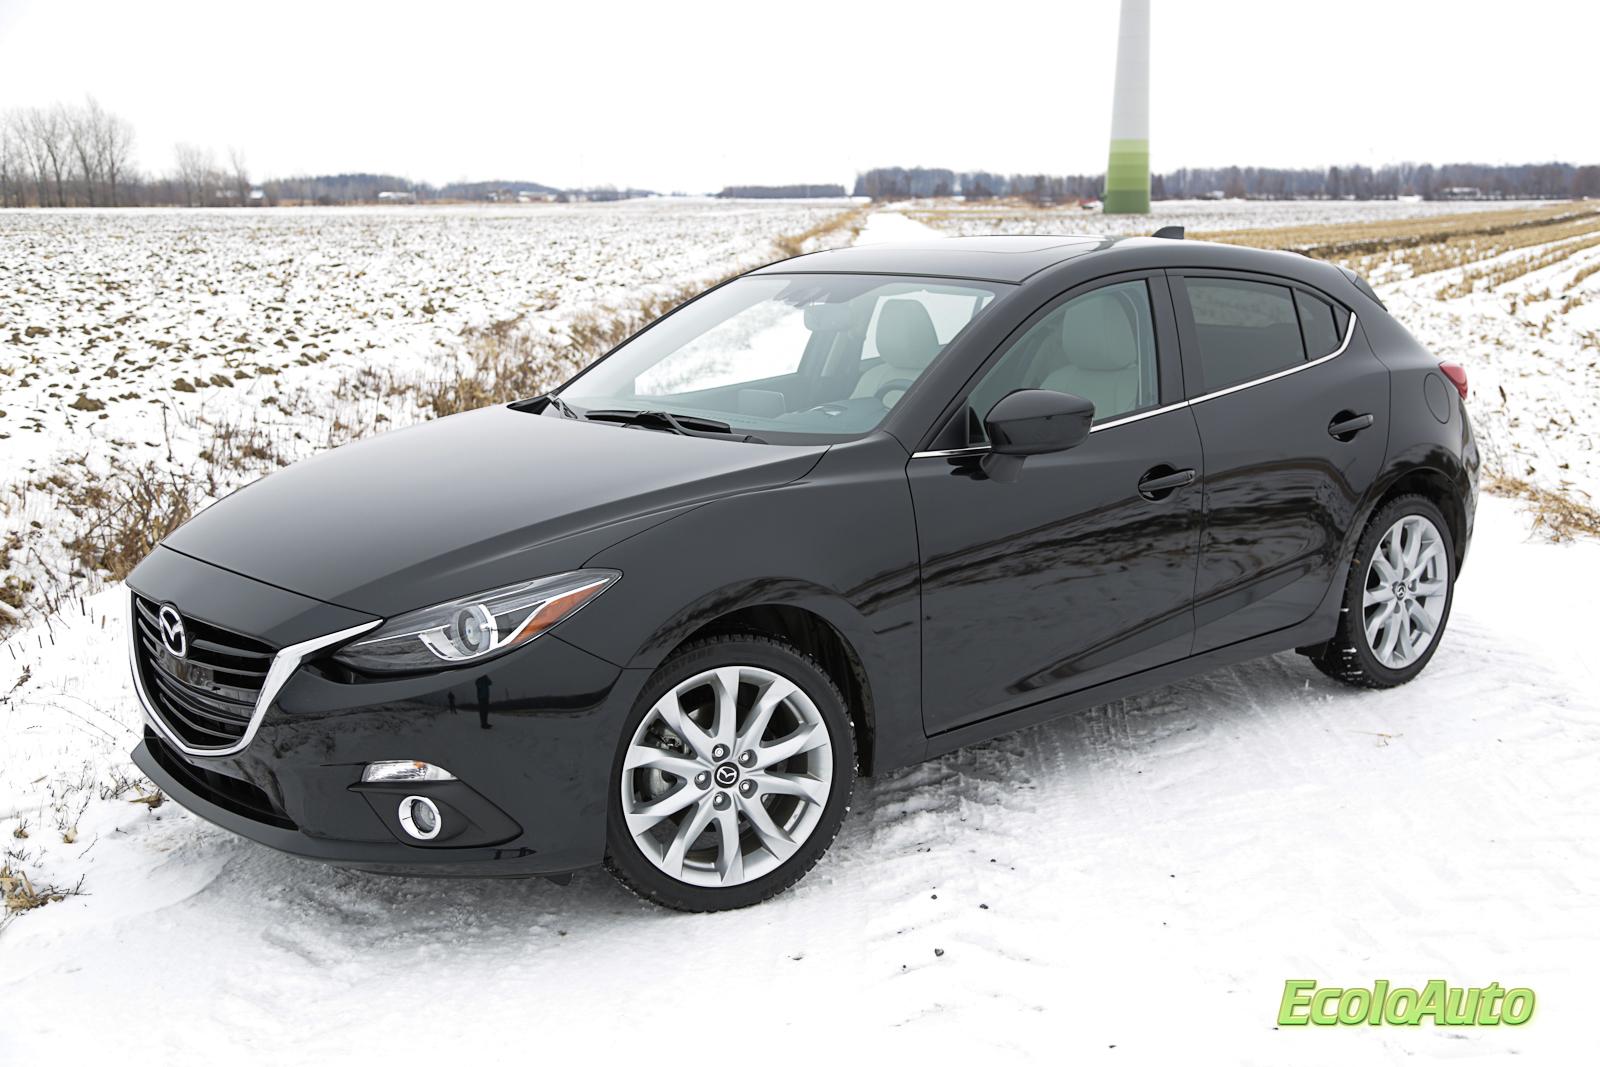 Mazda-3-2014-essai-routier-4